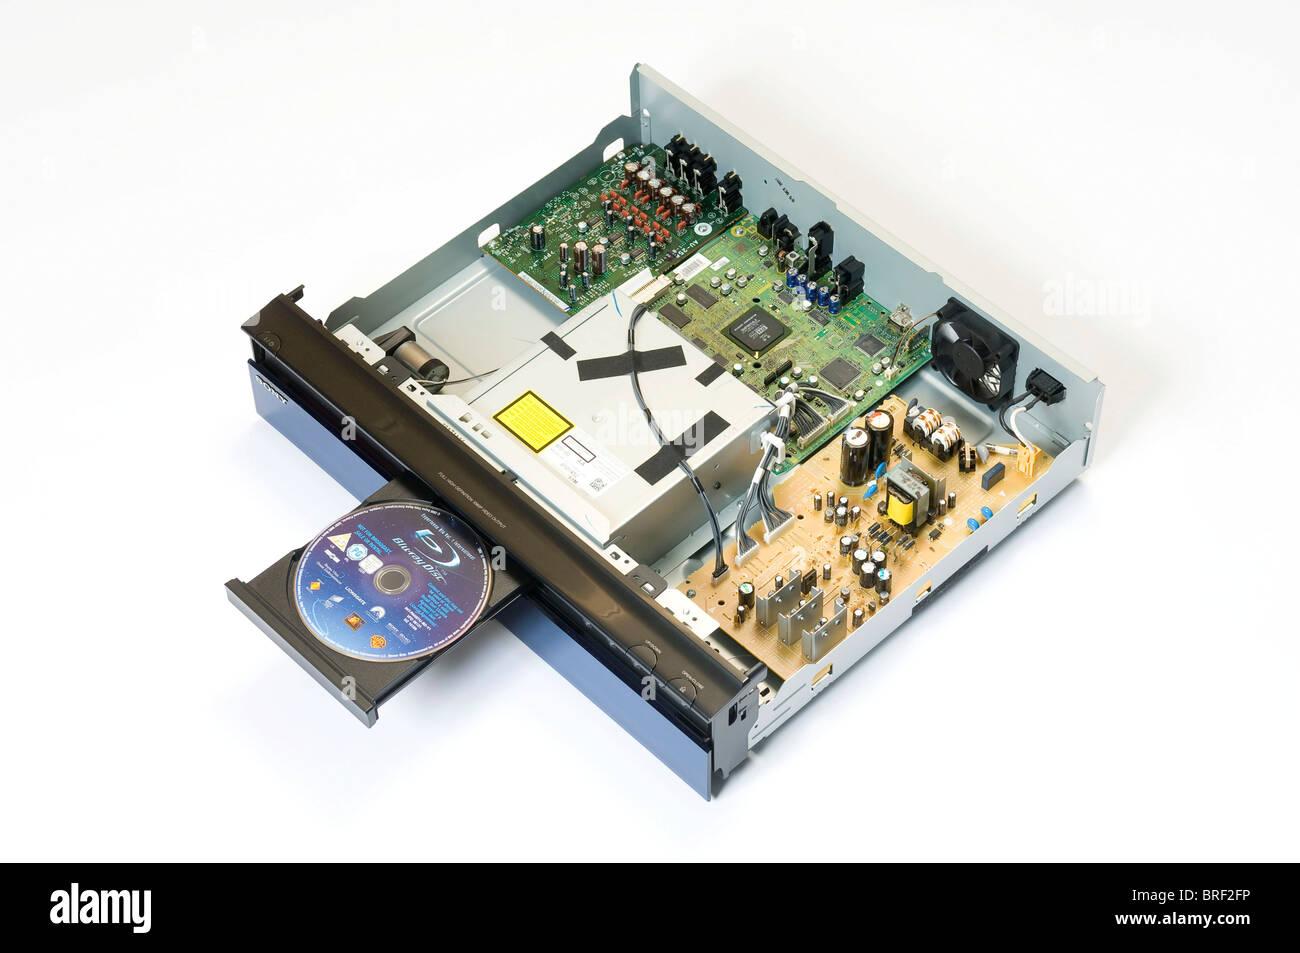 DVD Sony Lettore Blu-ray Immagini Stock